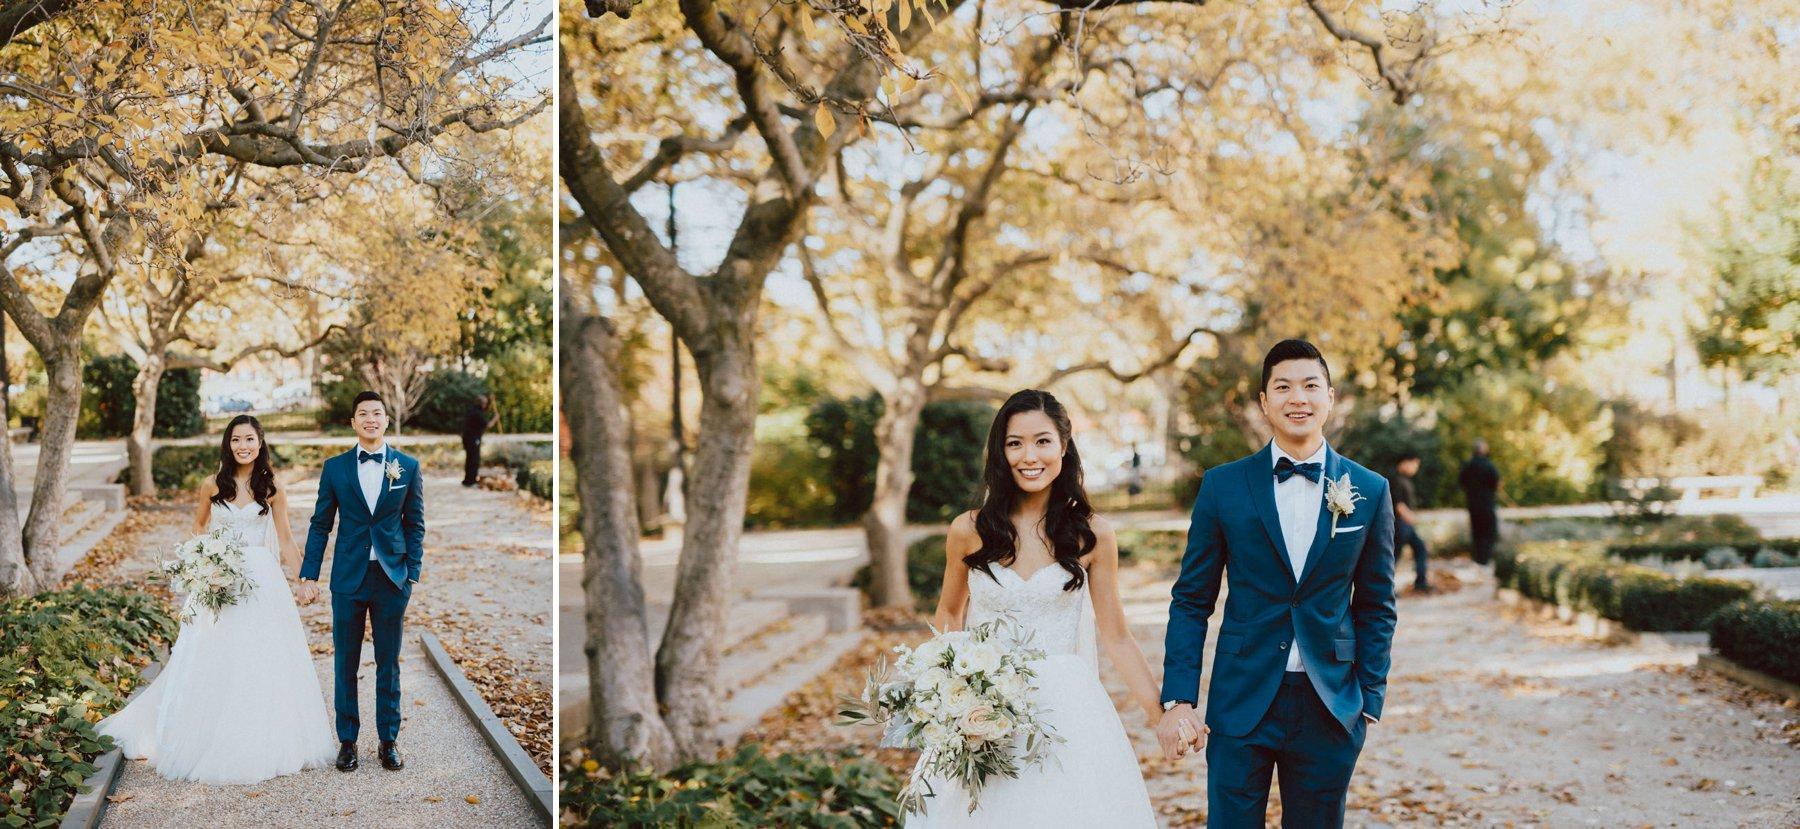 philadelphia-wedding-photographer-48.jpg